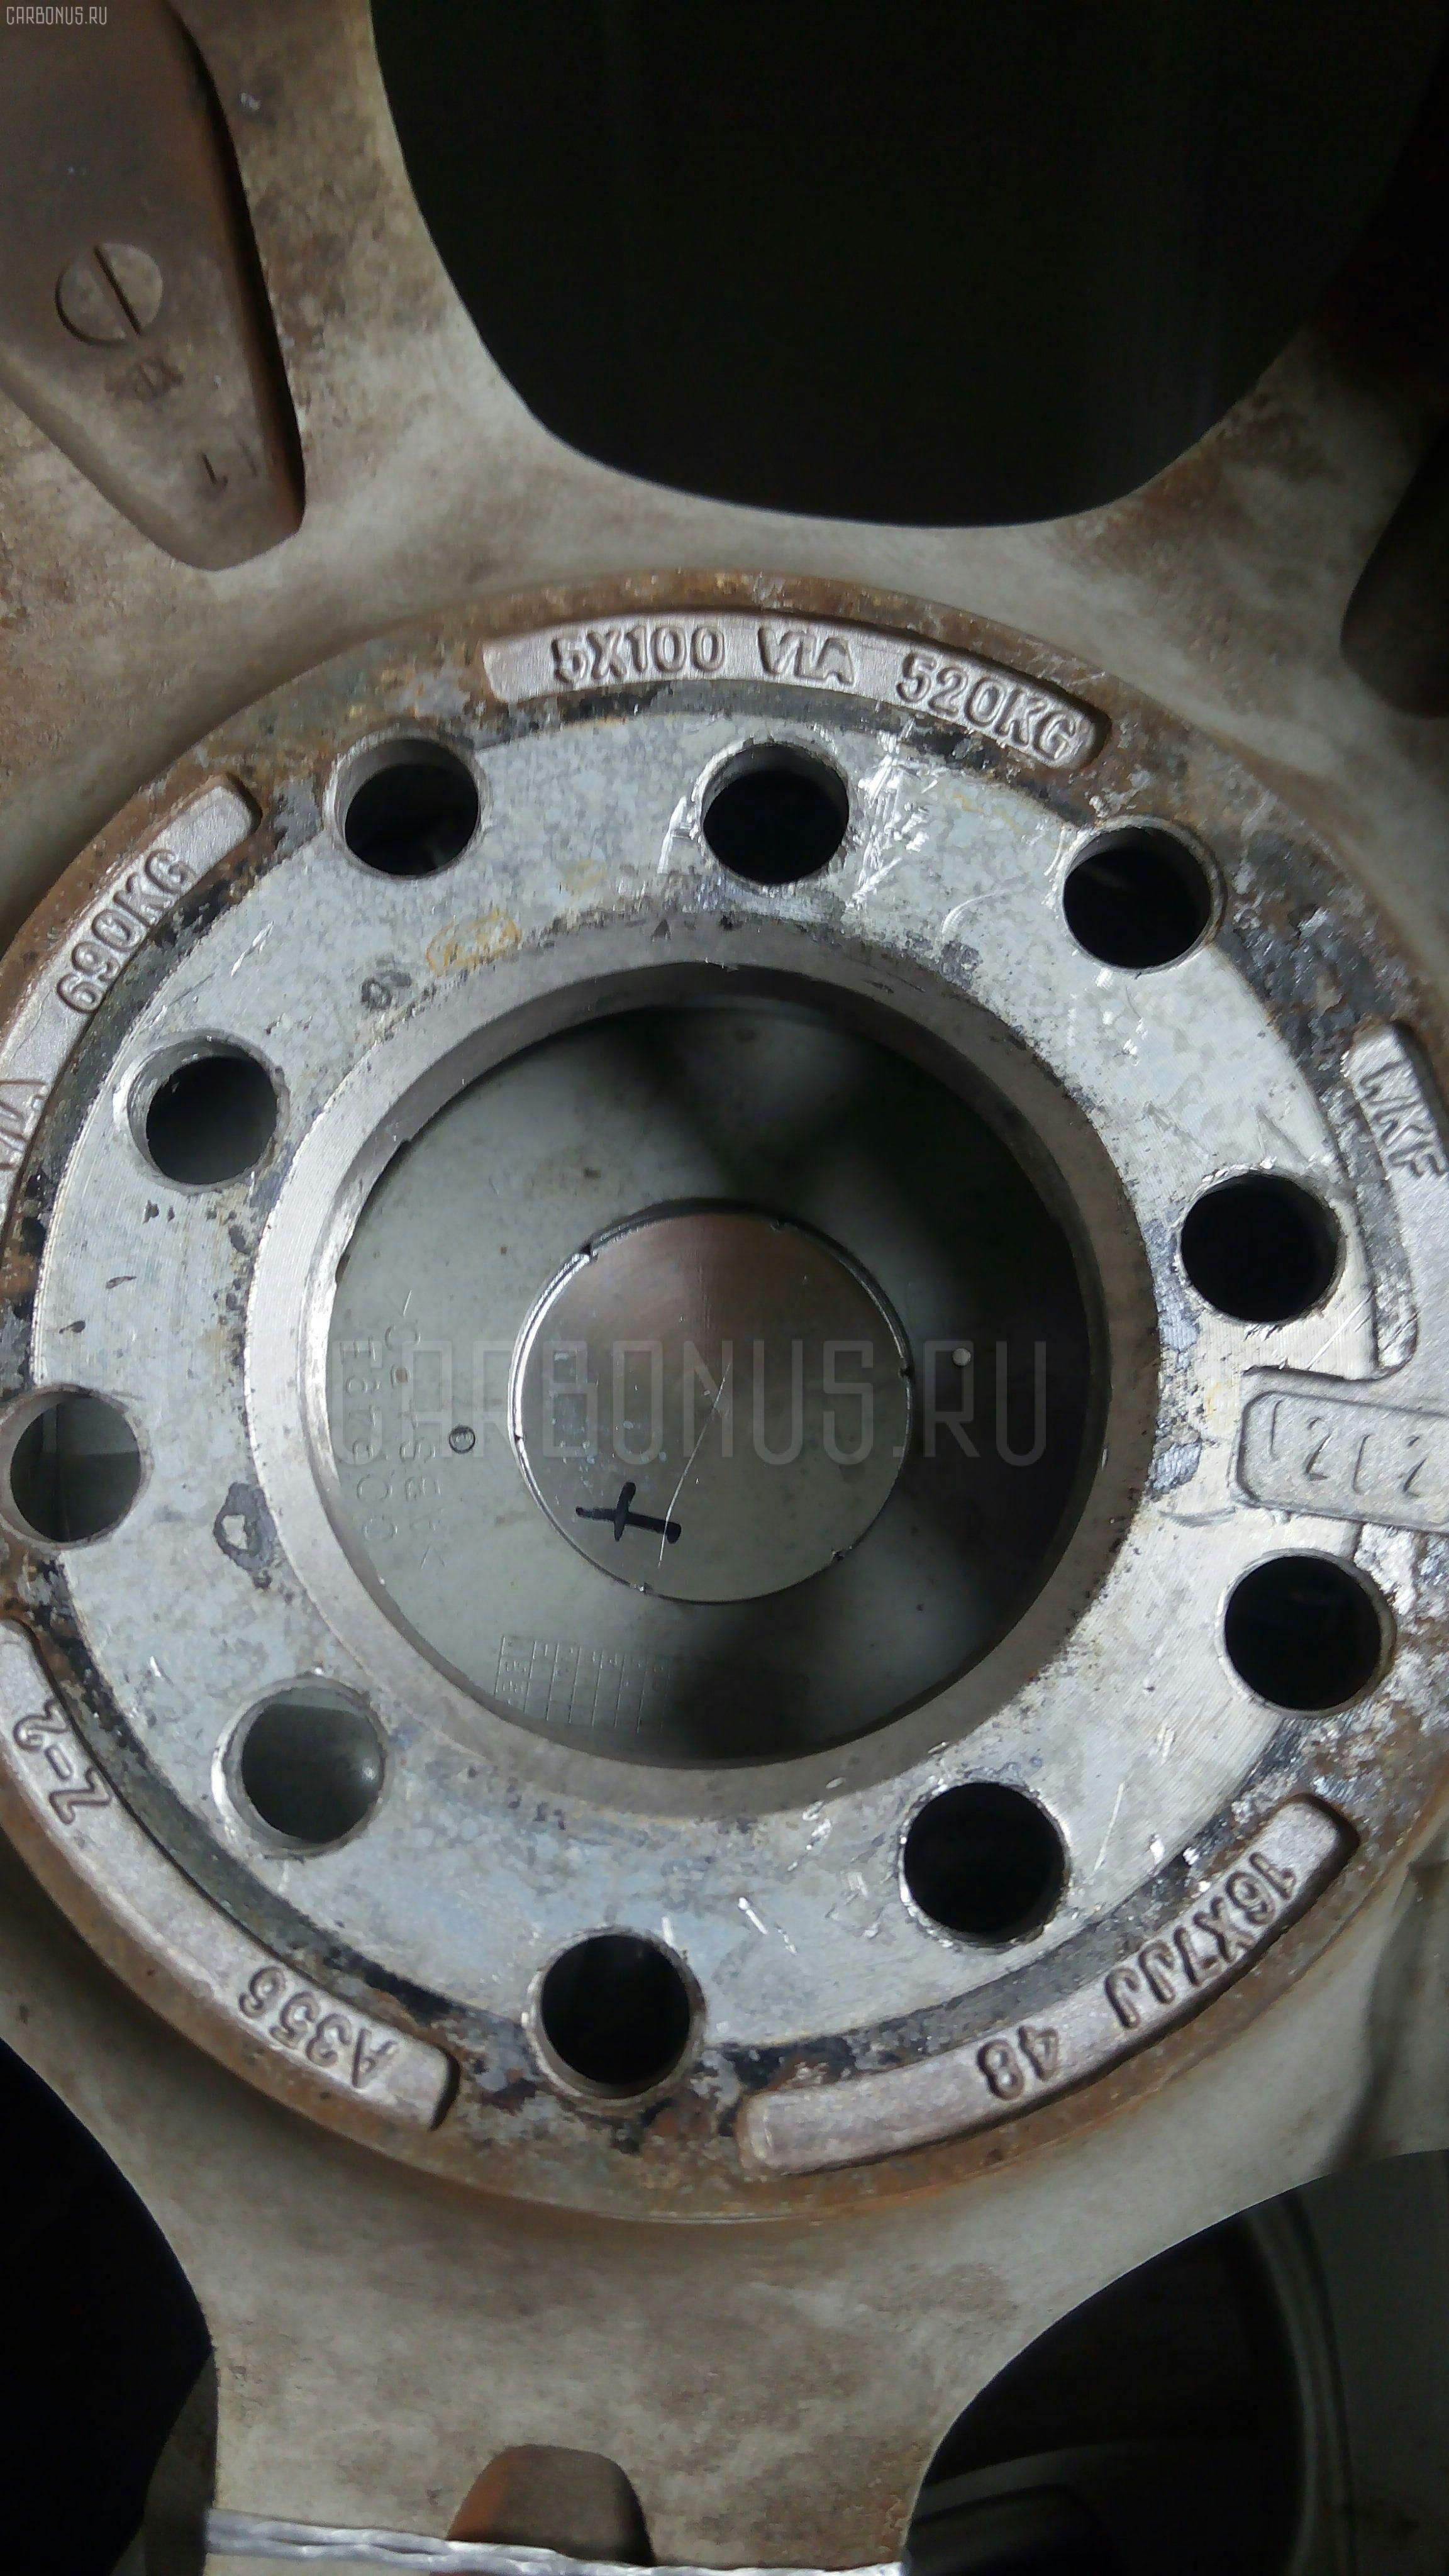 Диск литой R16 / 5-100/5-114.3 / 7JJ / ET+48 Фото 1